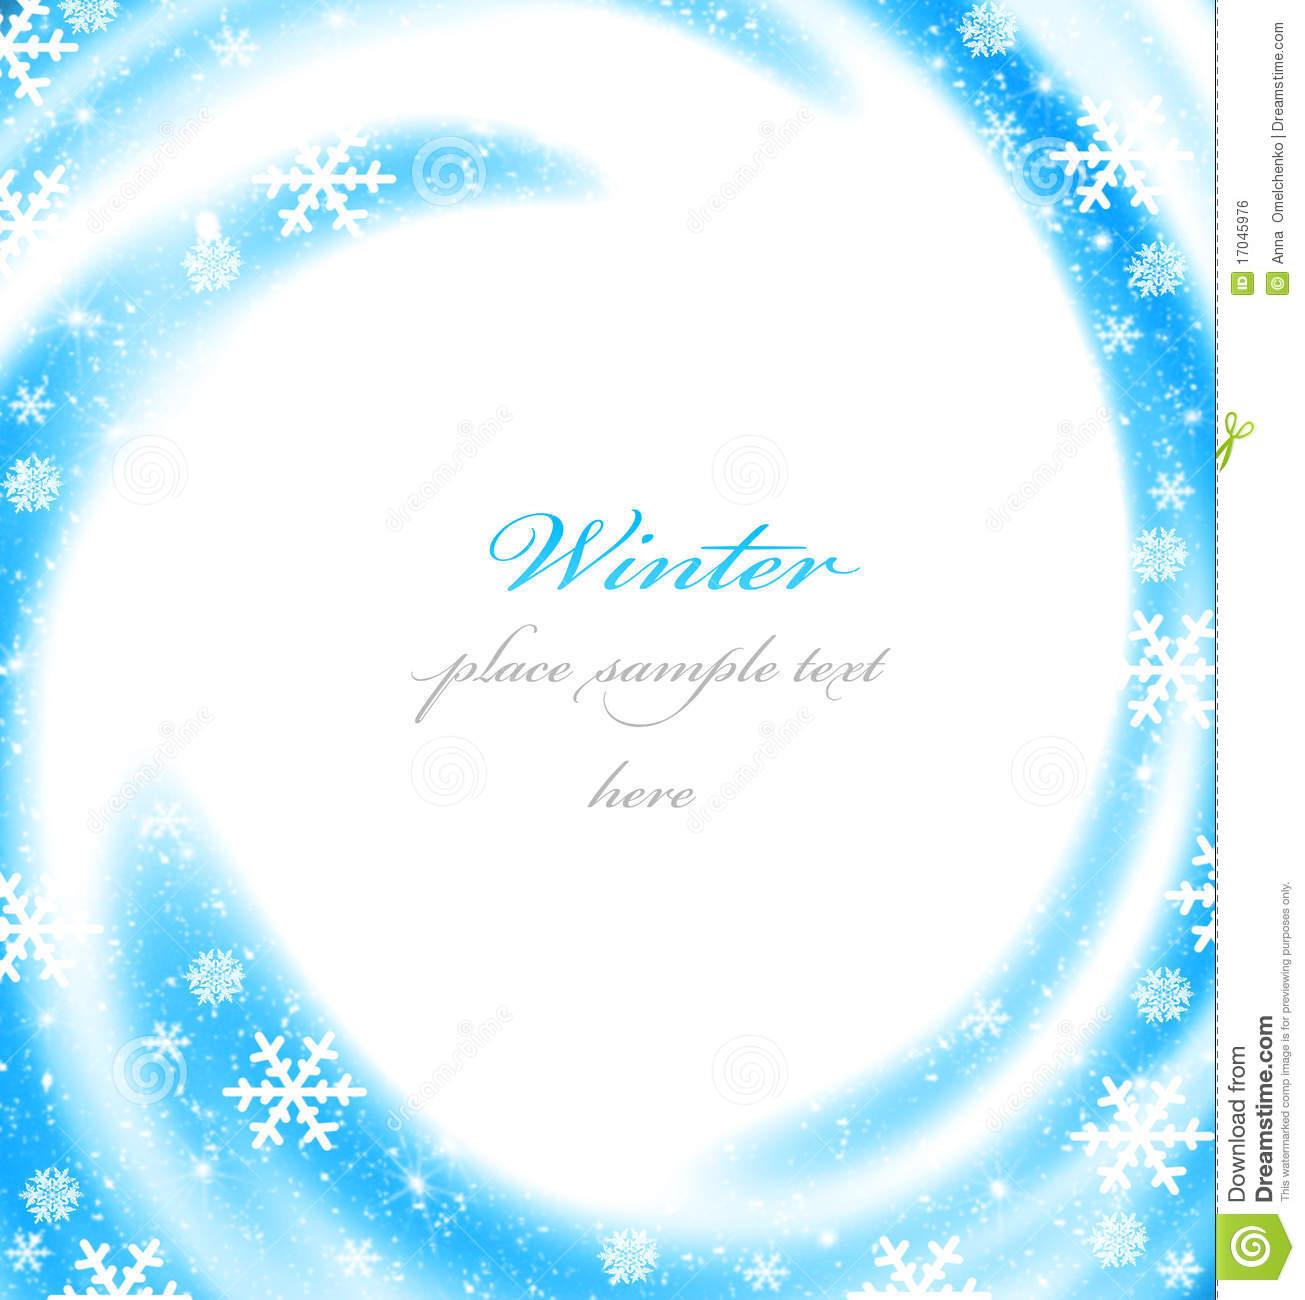 Free Winter Clip Art Borders. Christmas border card Royalty .